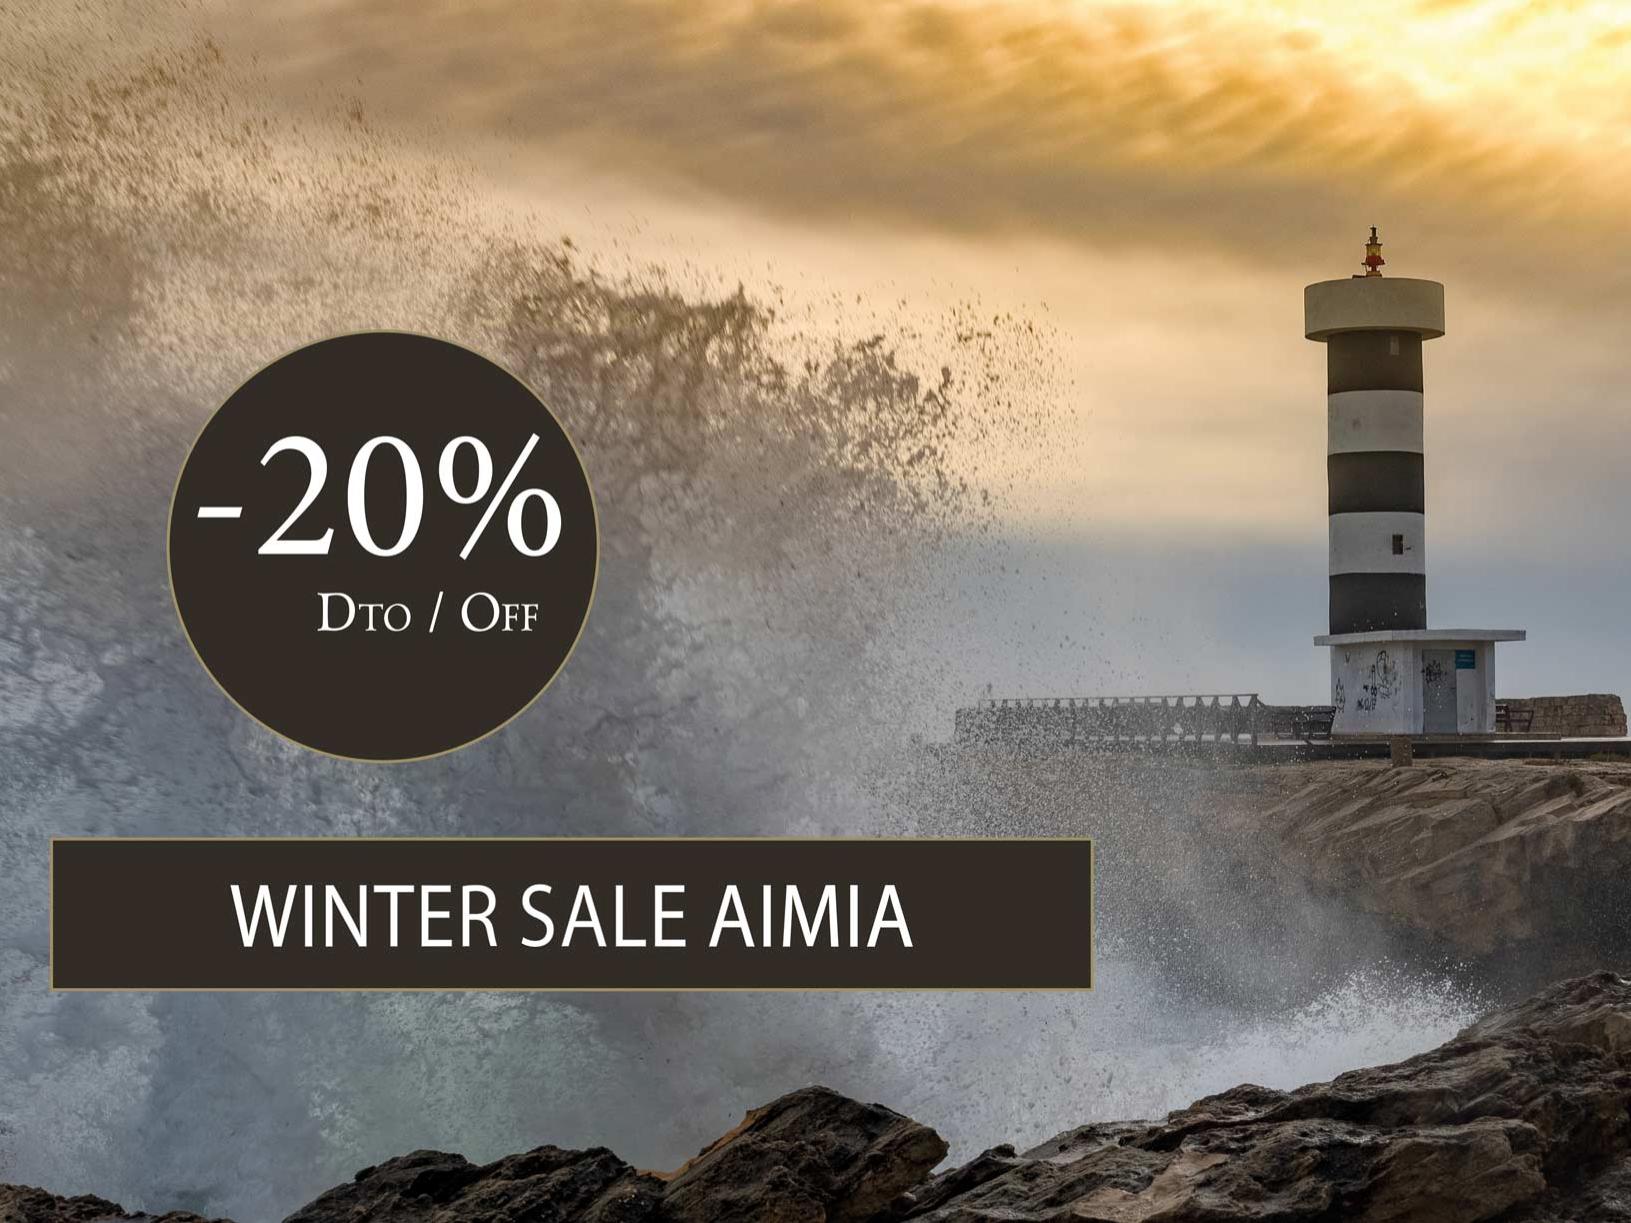 Oferta Winter-Sale - Aimia Hotel Port de Soller